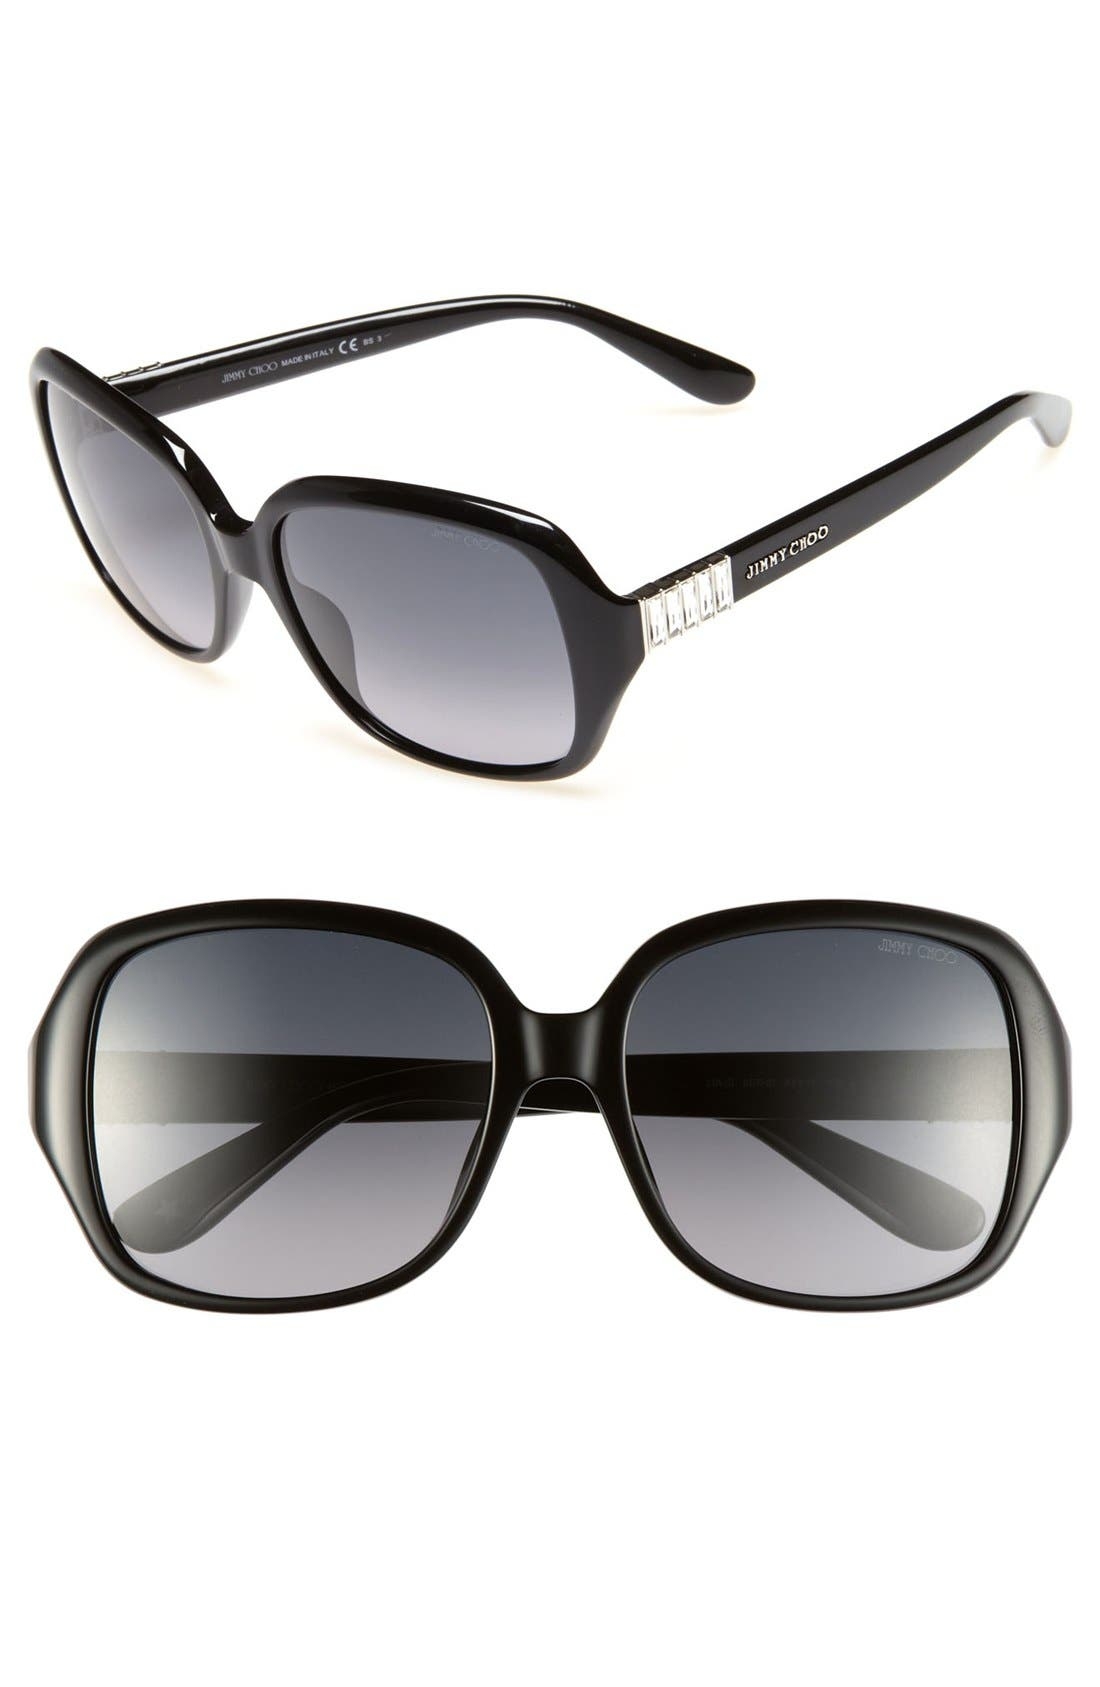 Main Image - Jimmy Choo 'Lia' 56mm Sunglasses